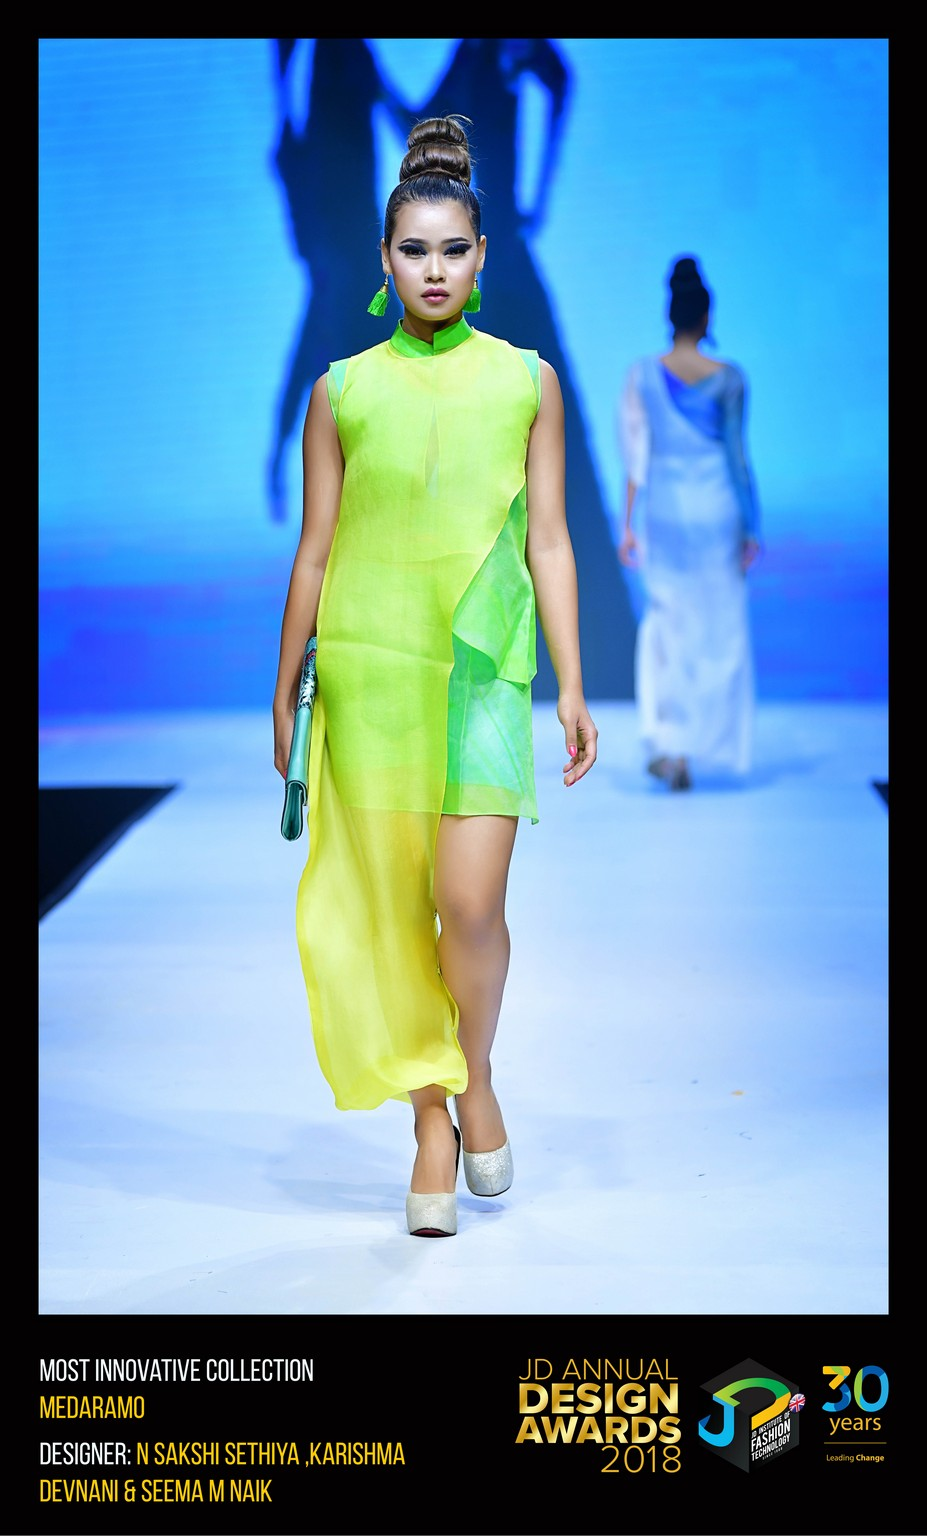 Medaramo – Change – JD Annual Design Awards 2018 | Designer: Sakshi, seema and Karishma DFD October 2017 | Photography : Jerin Nath (@jerin_nath) medaramo - Medaramo4 - Medaramo – Change – JD Annual Design Awards 2018